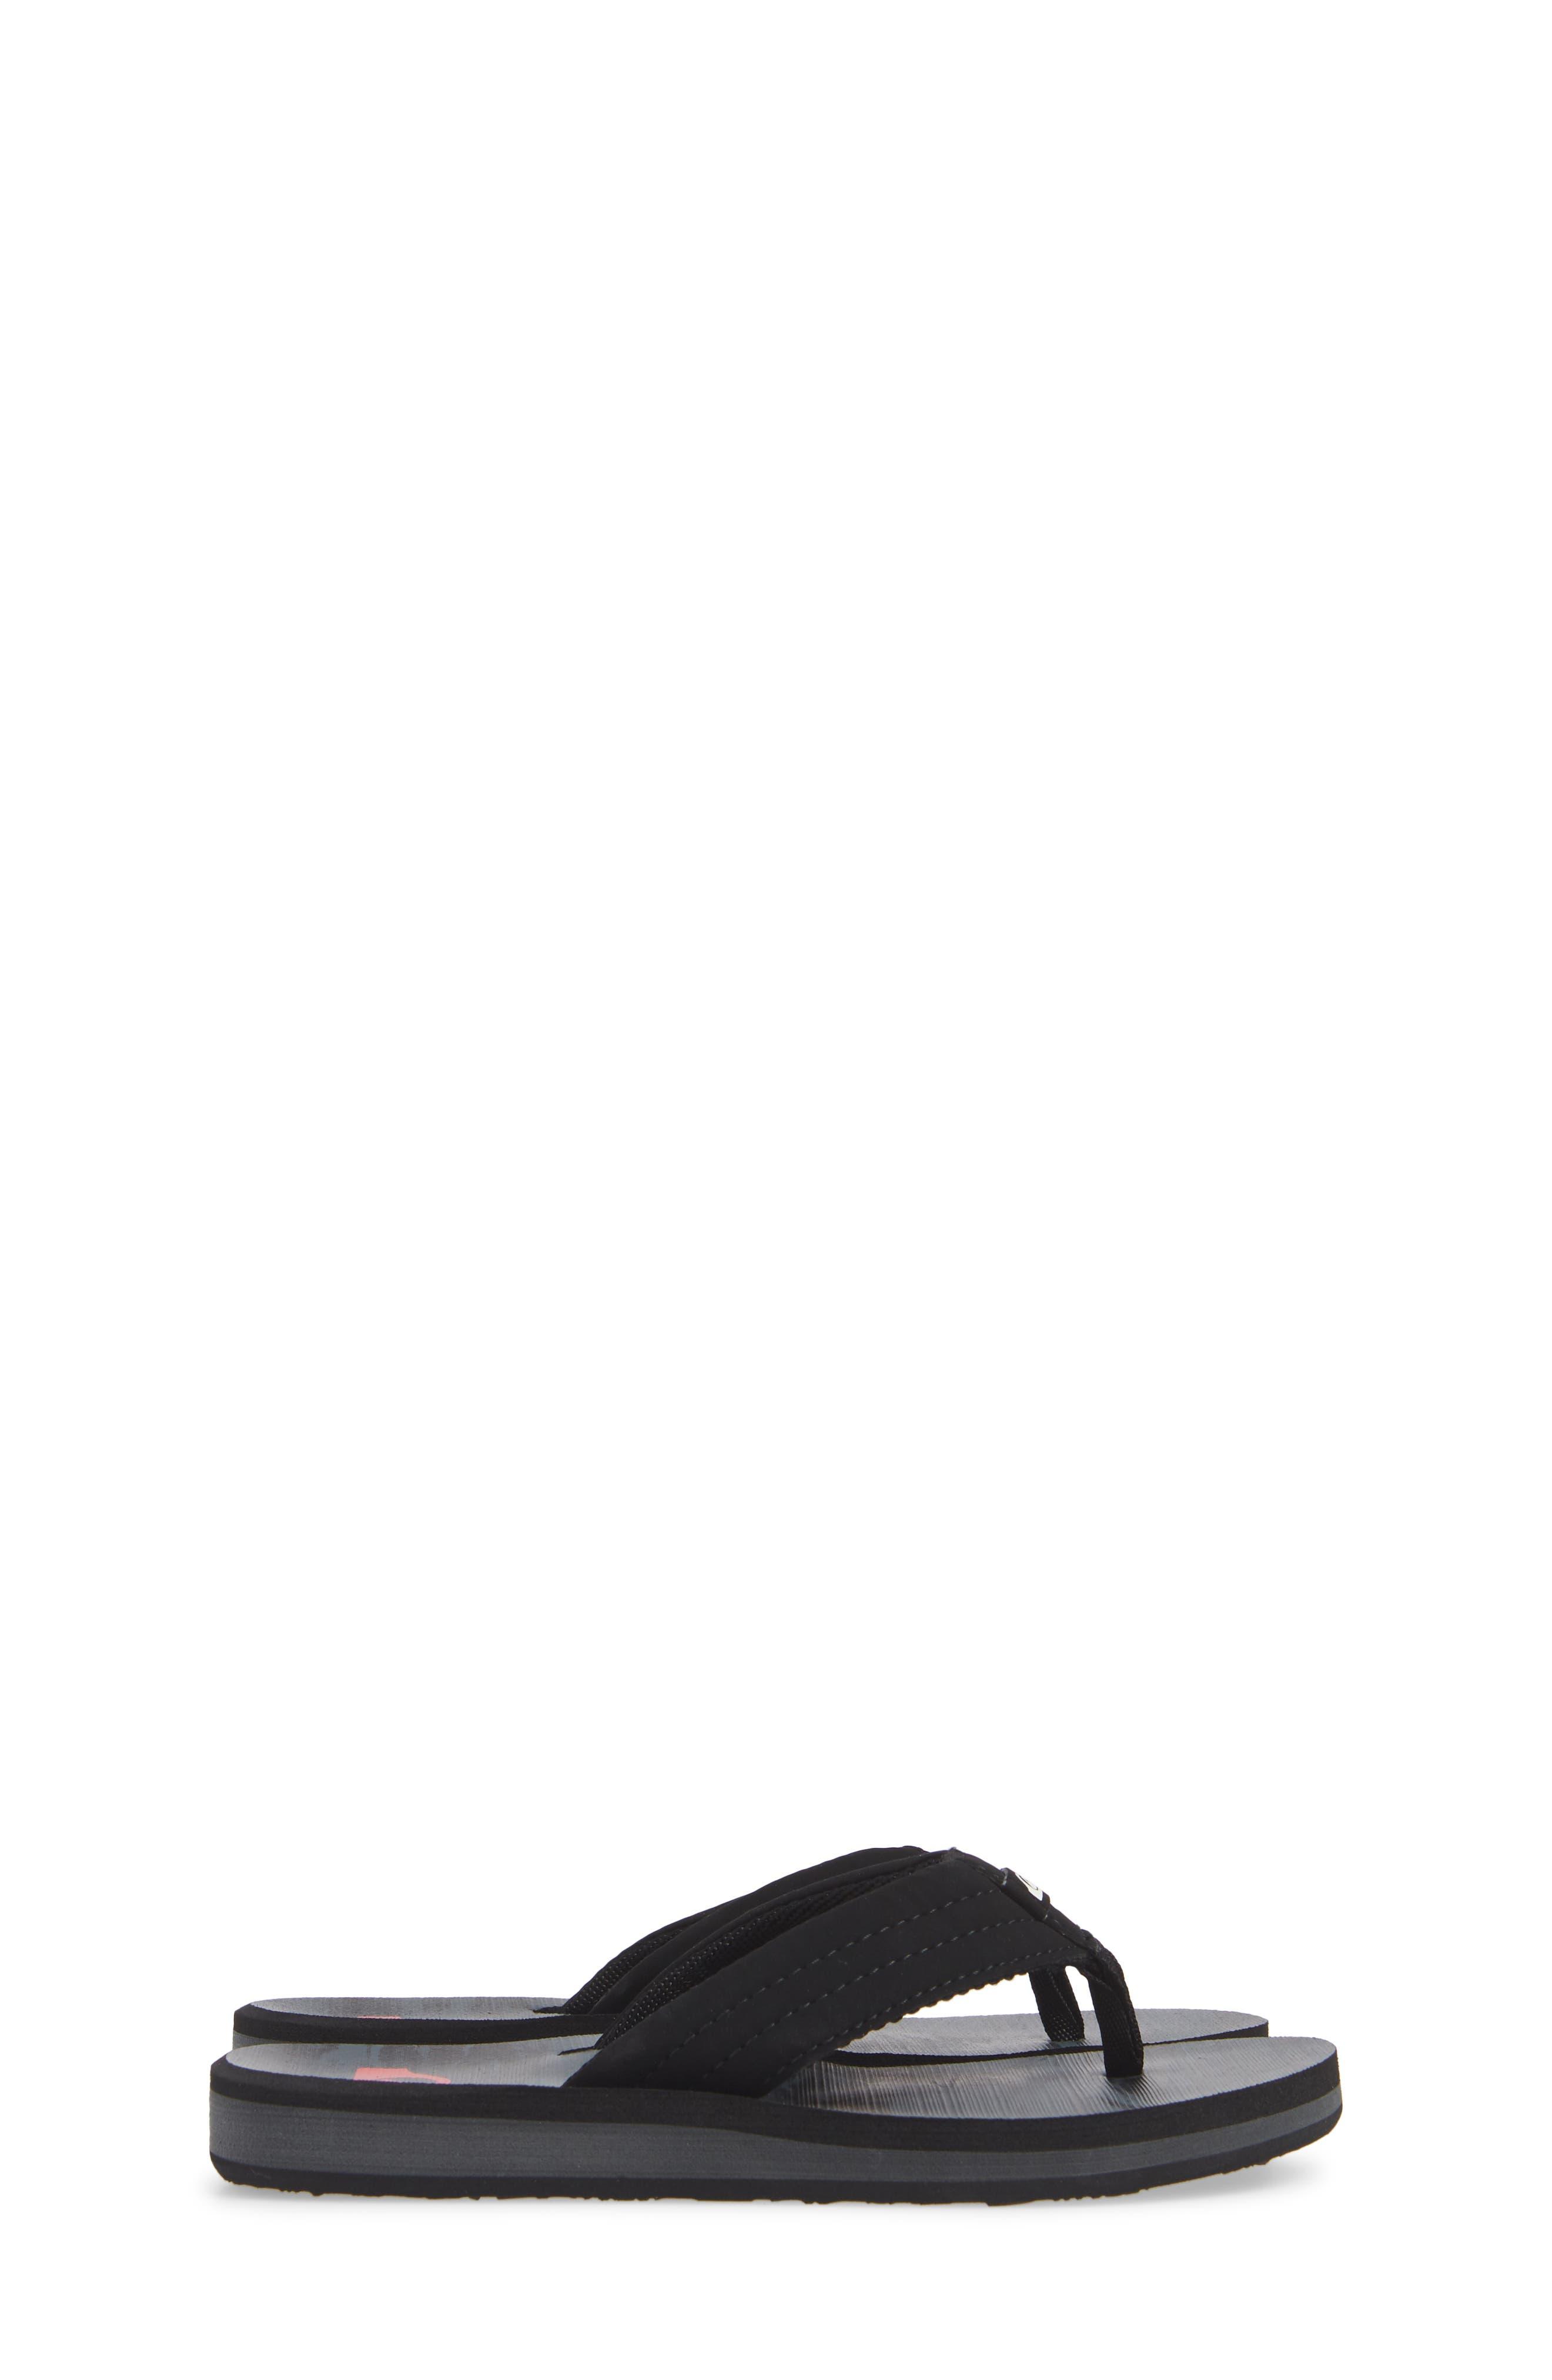 Carver Flip Flop,                             Alternate thumbnail 4, color,                             BLACK/ GREY/ GREY SYNTHETIC